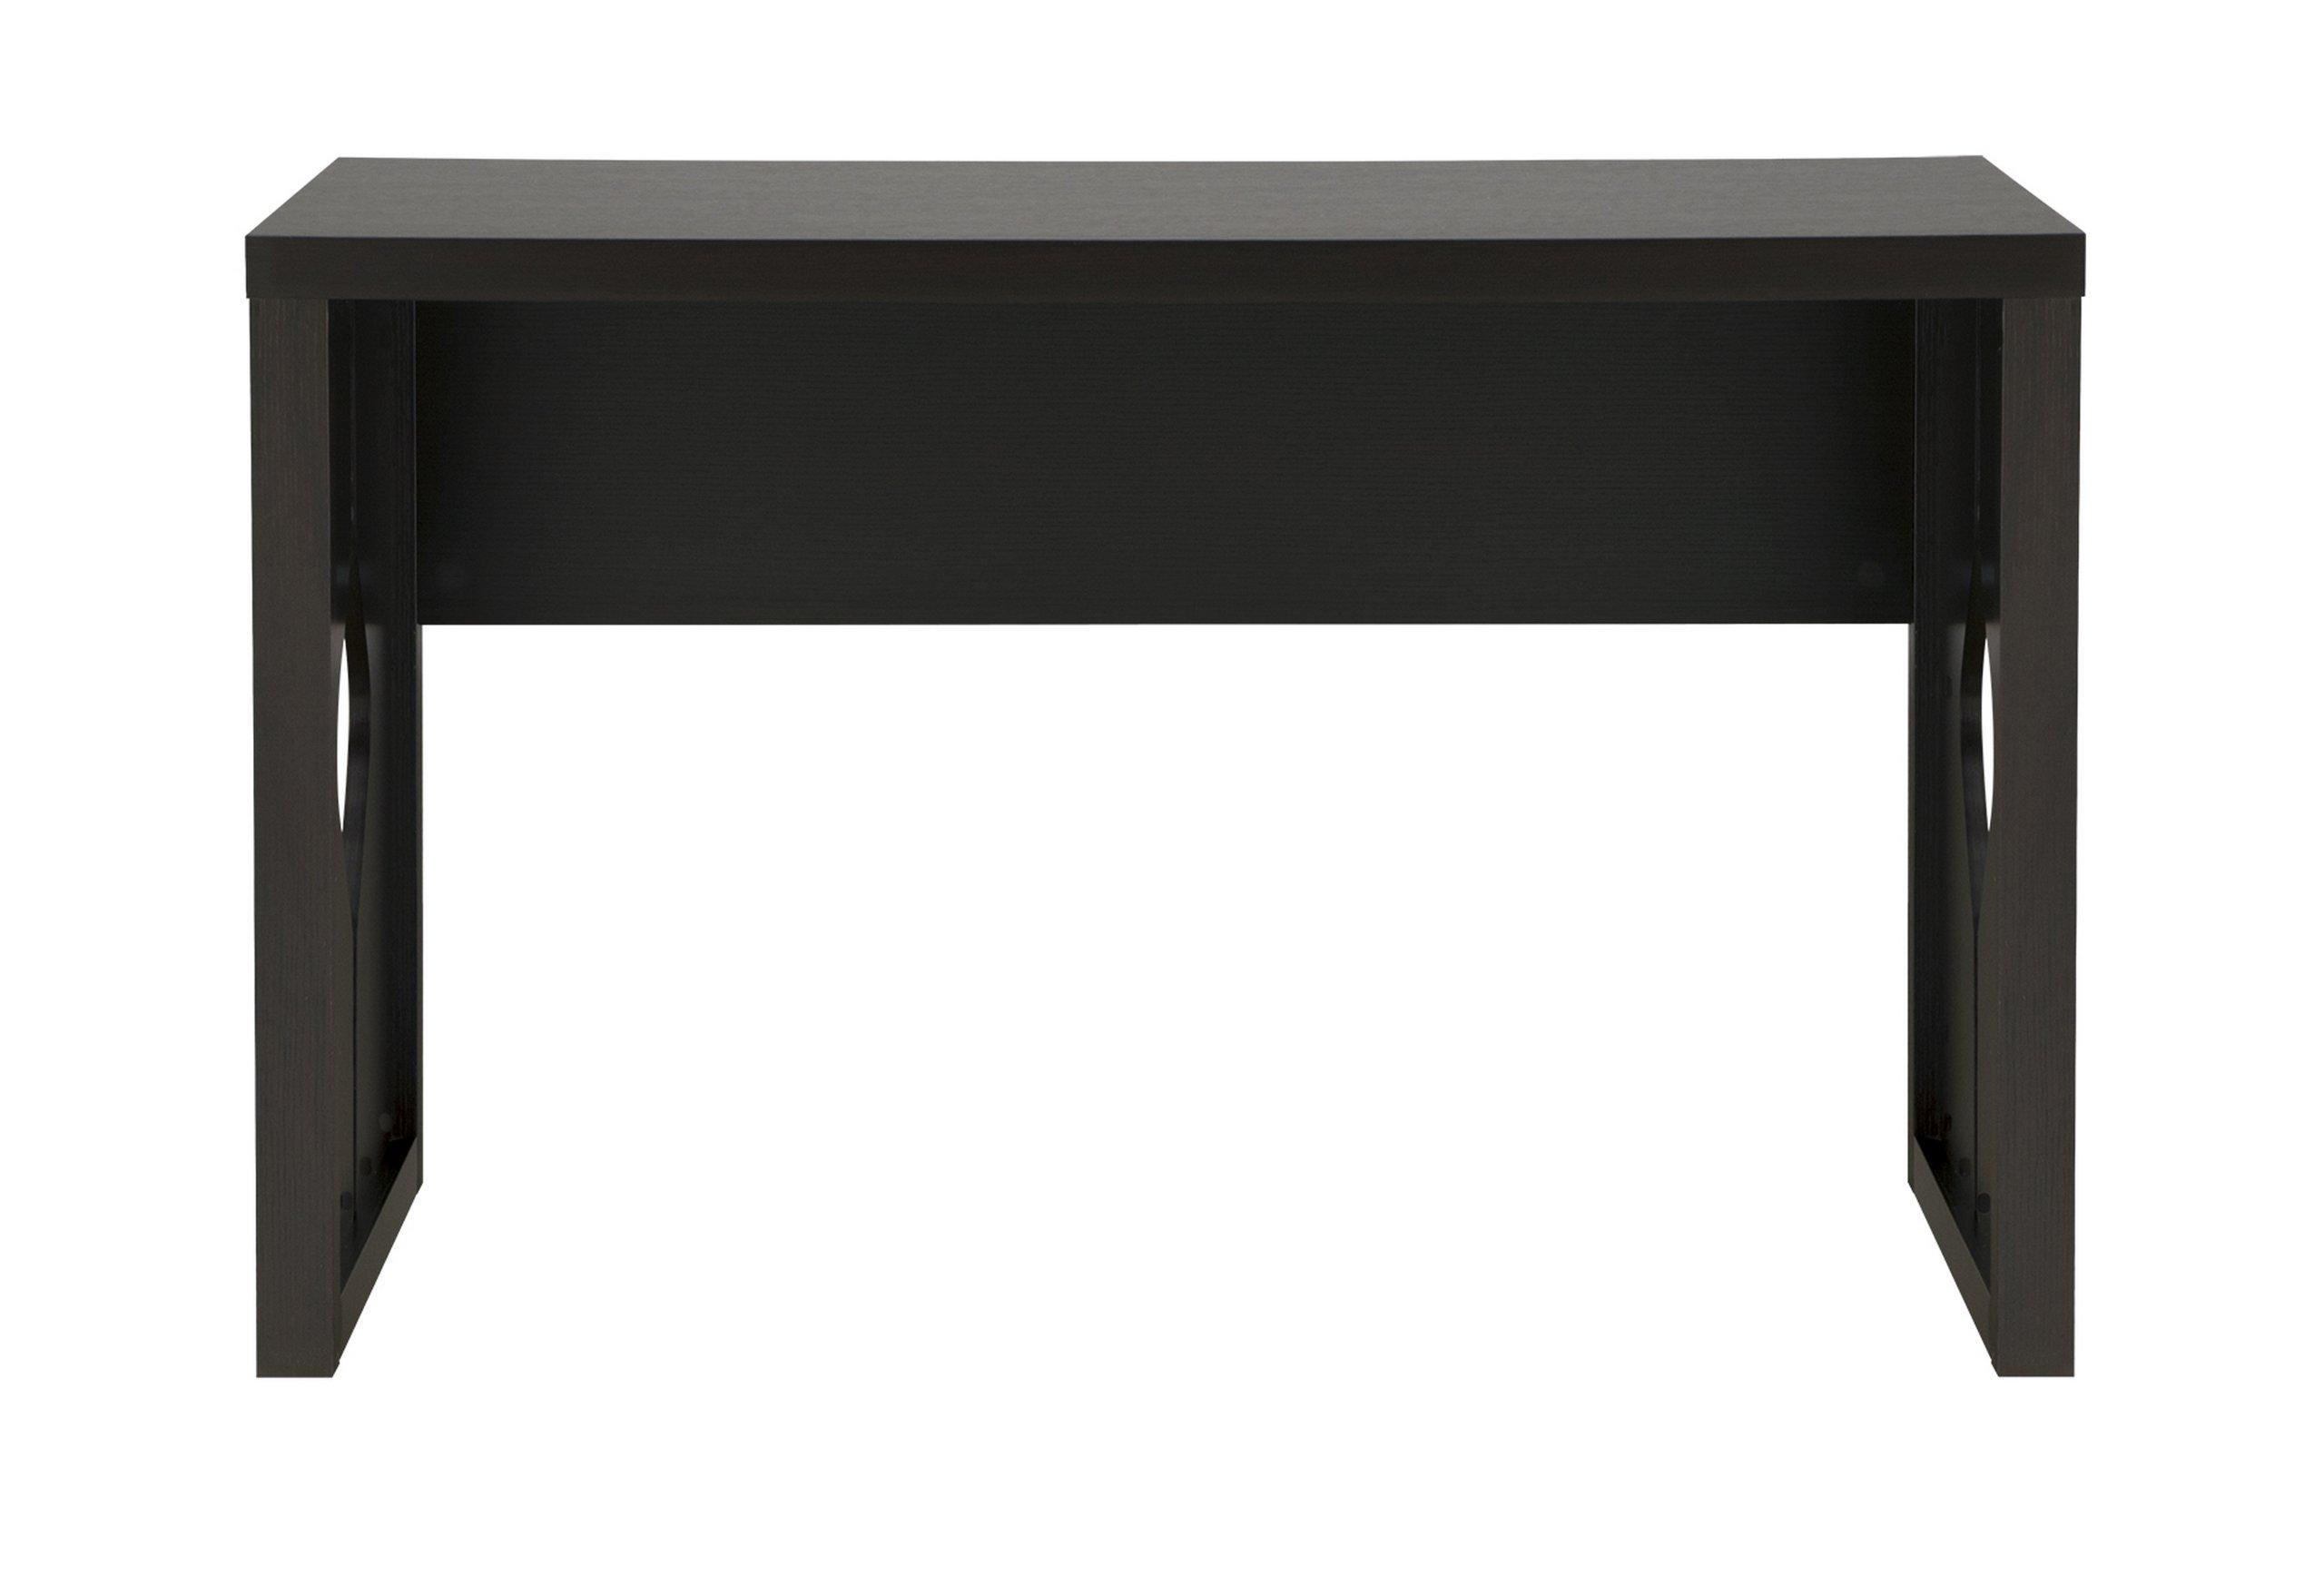 Furniture of America Dimone Cut-Out Home Office Desk